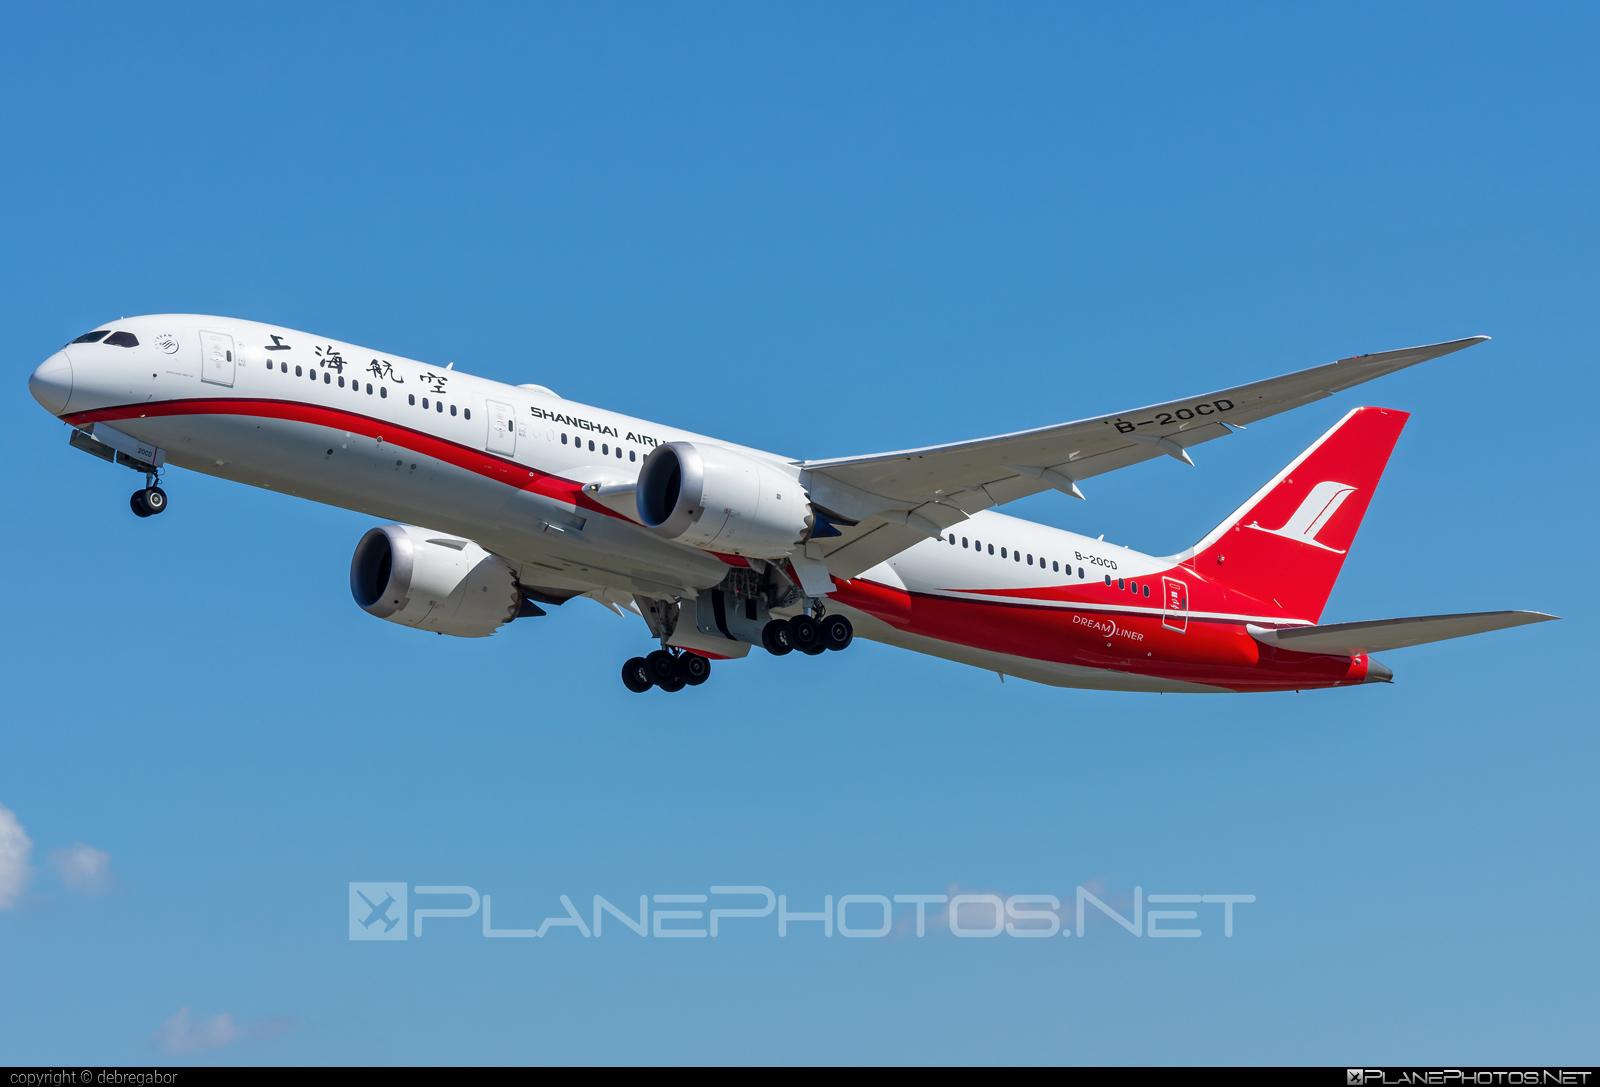 Boeing 787-9 Dreamliner - B-20CD operated by Shanghai Airlines #b787 #boeing #boeing787 #dreamliner